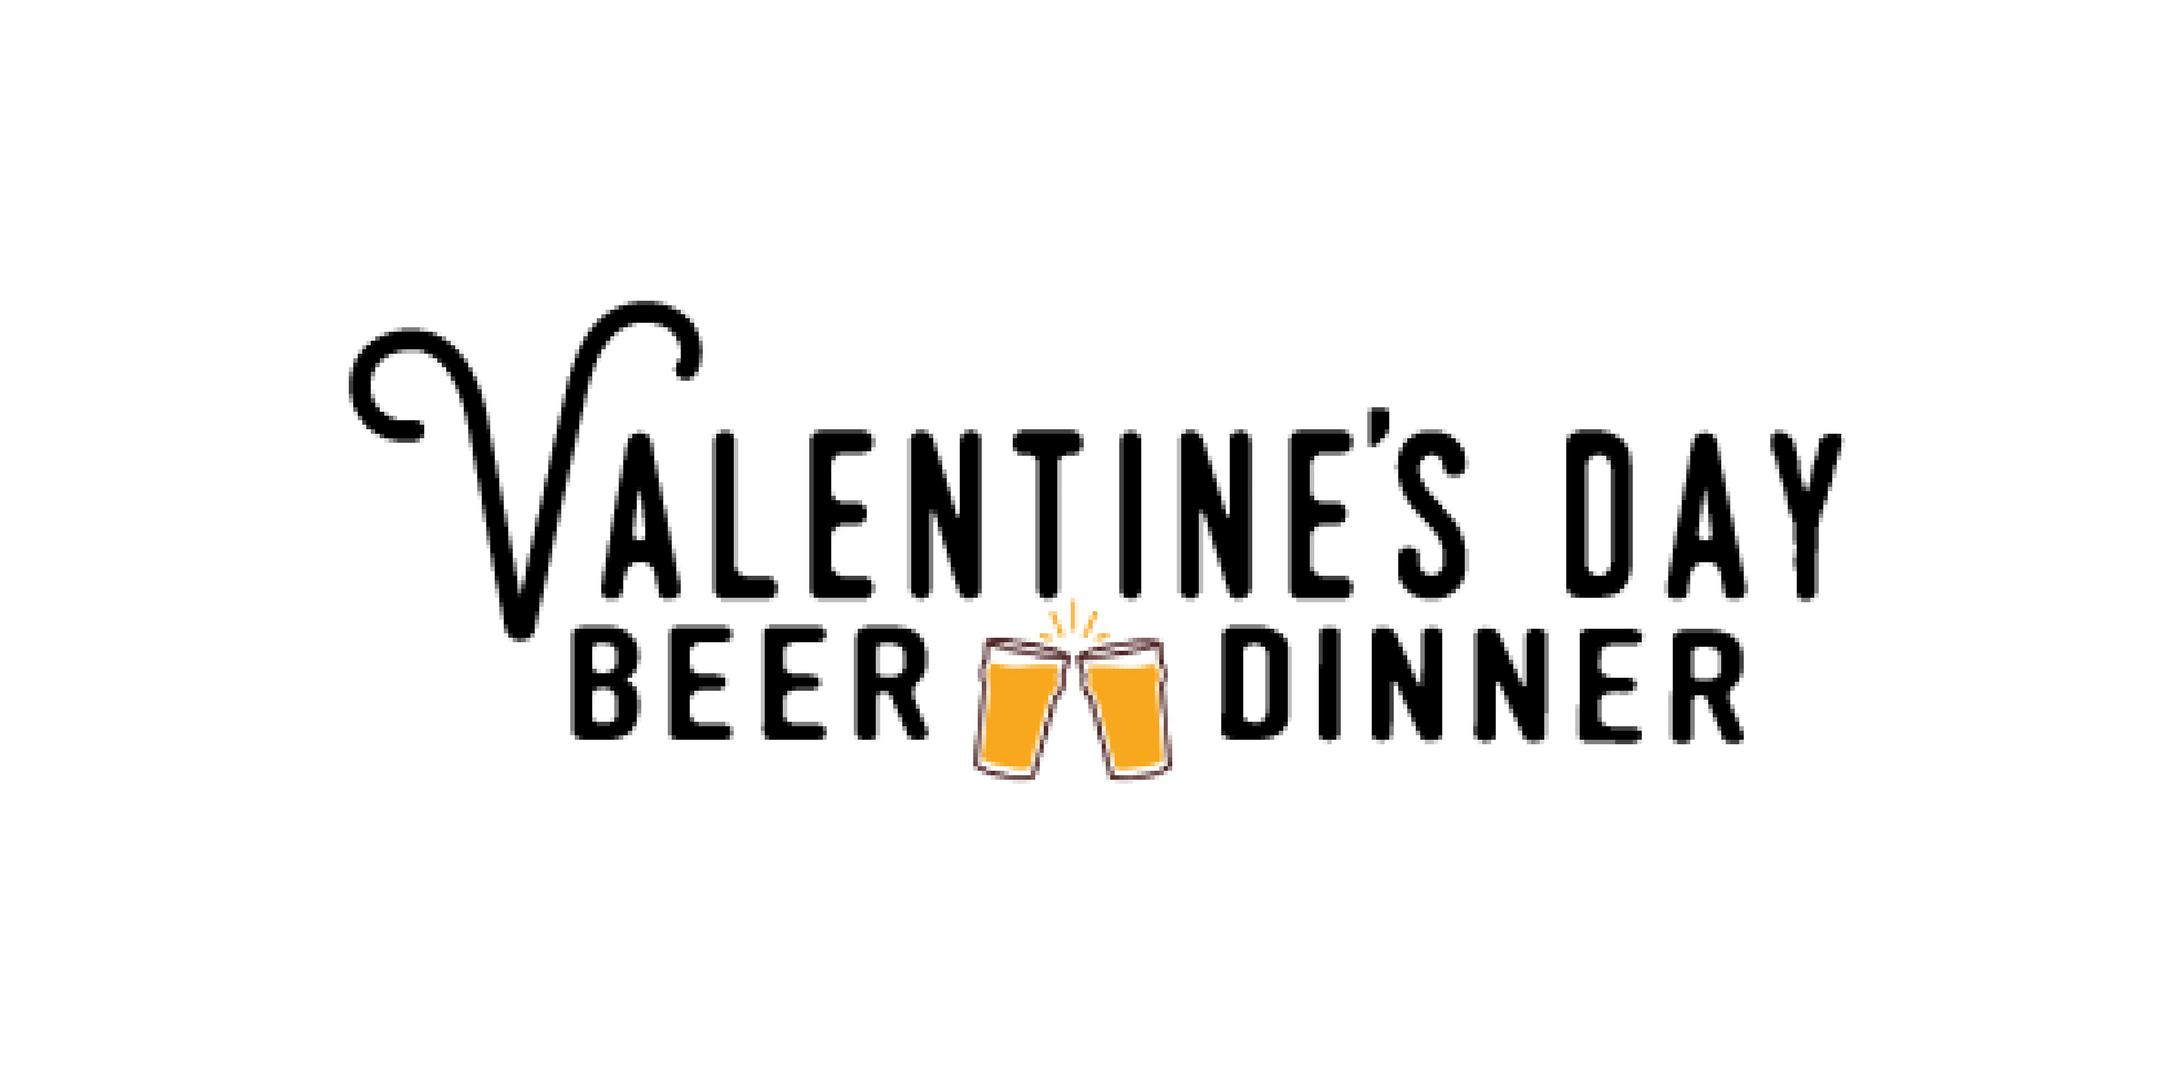 upland carmel tap house | valentine's day beer dinner - 14 feb 2017